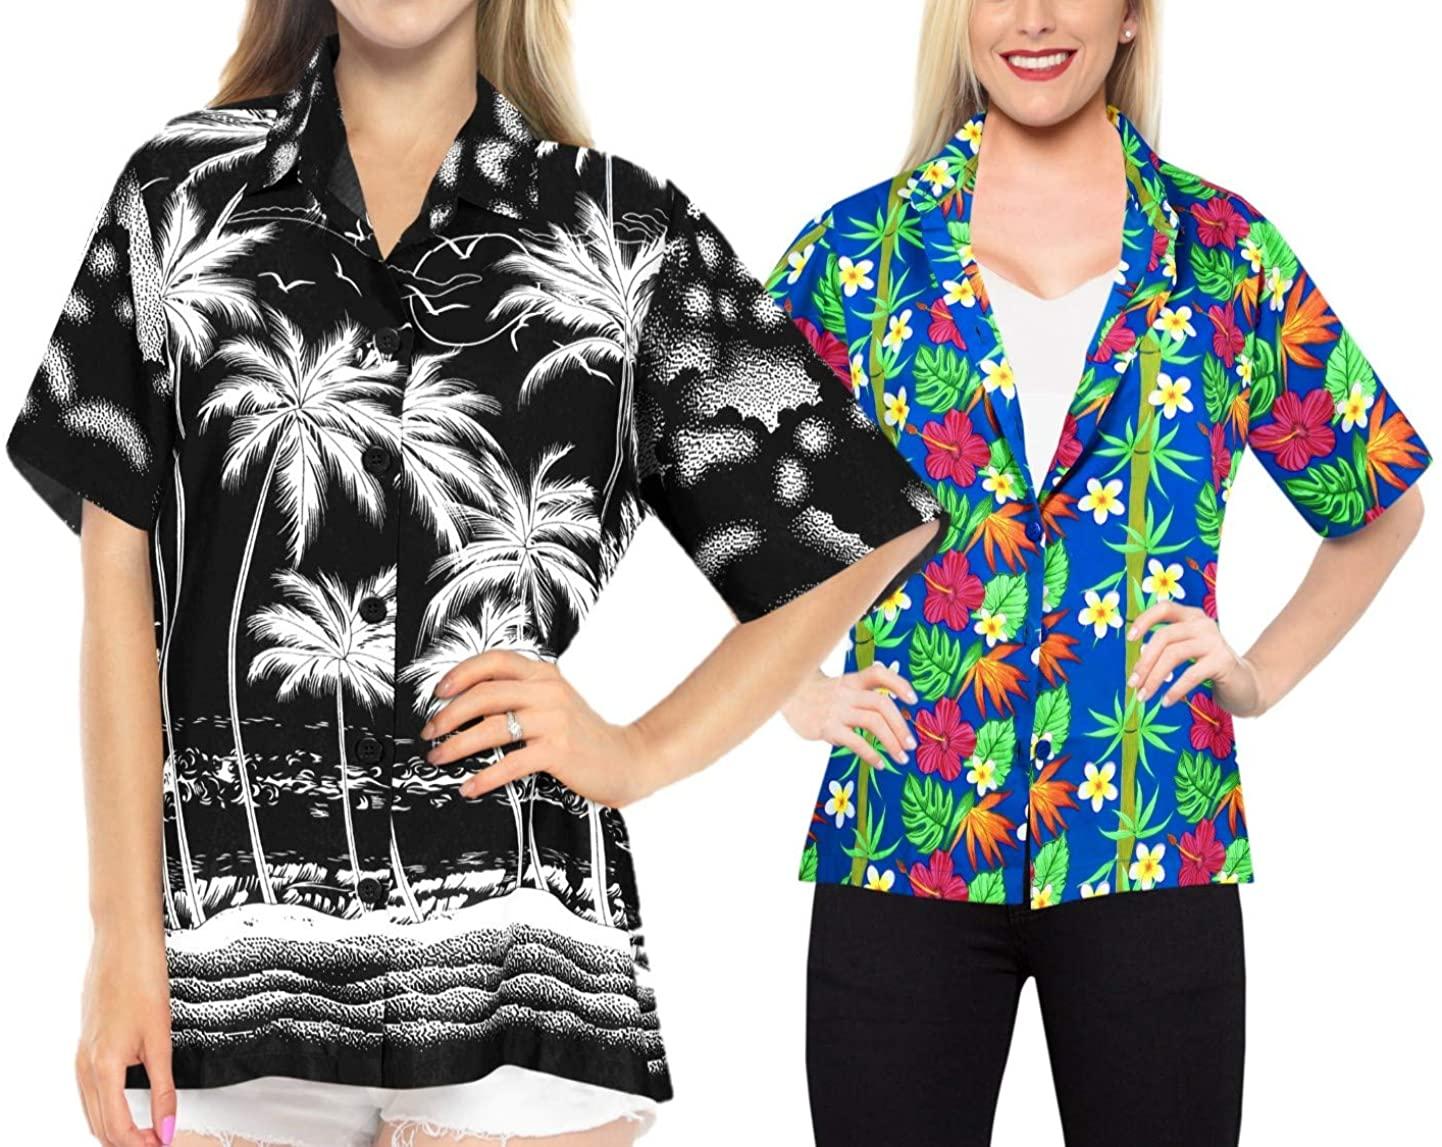 LA LEELA Women's Hawaiian Shirt Beach Aloha Party Casual Holiday Work from Home Clothes Women Beach Shirt Blouse Shirt Combo Pack of 2 Size L